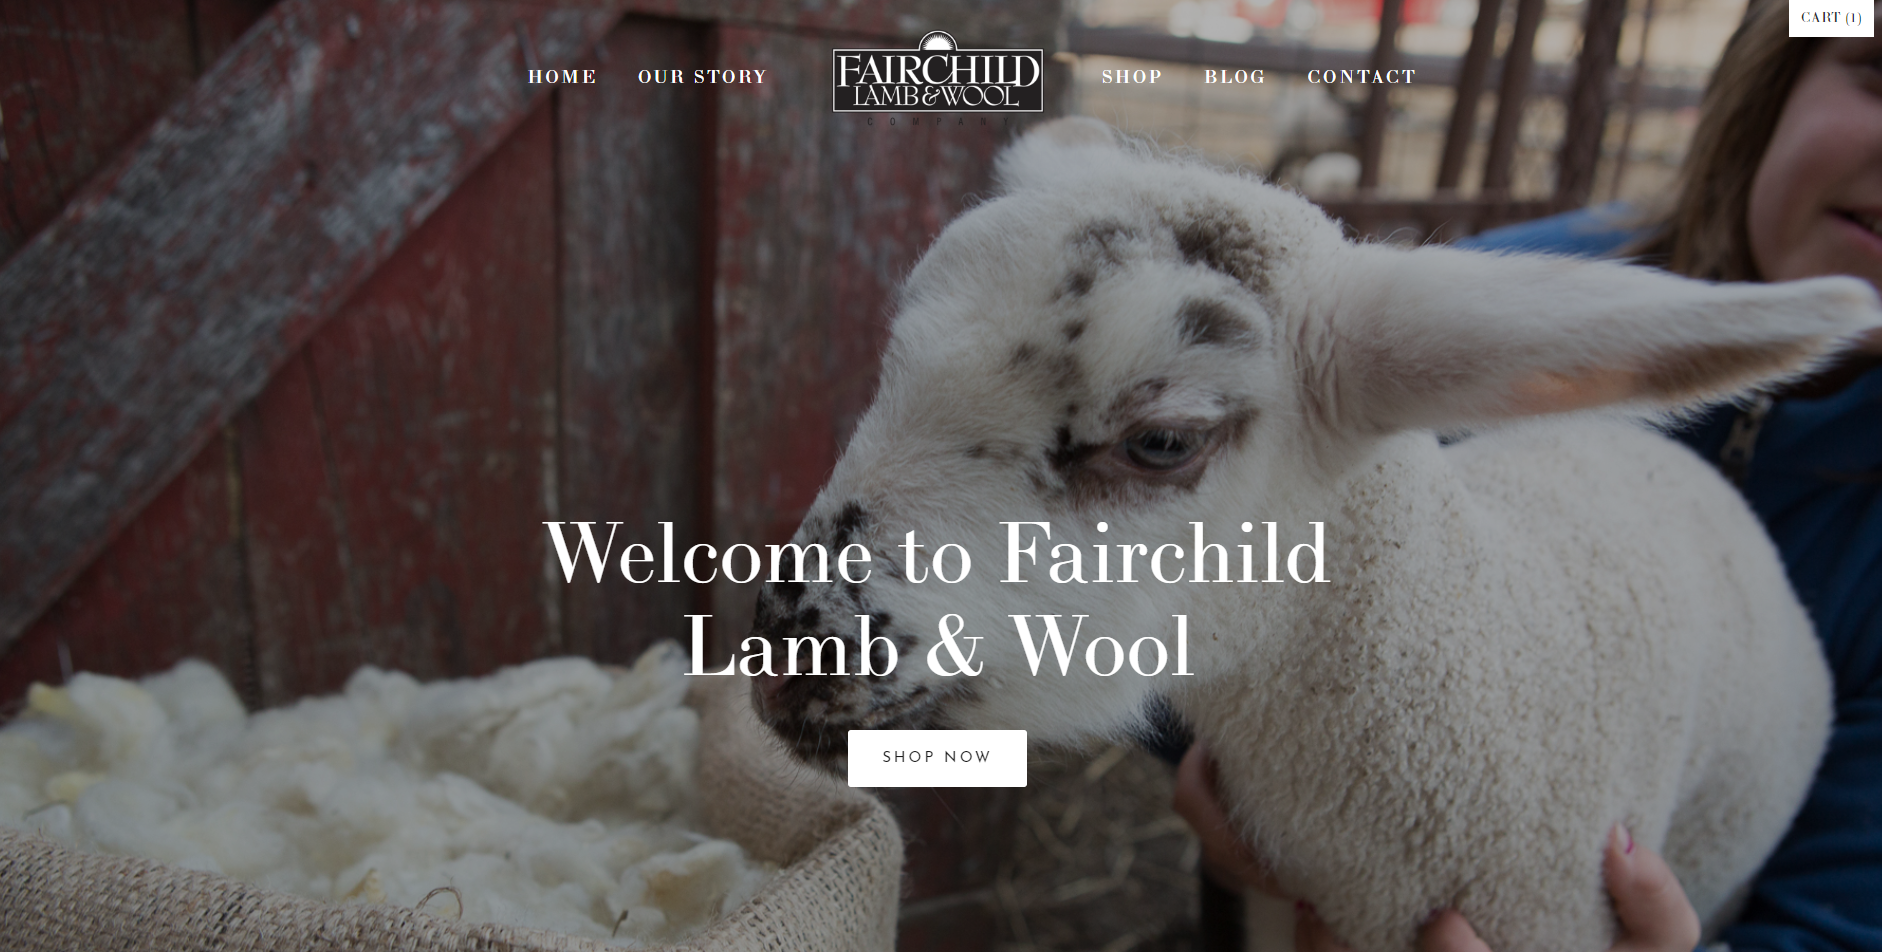 Fairchild Lamb & Wool